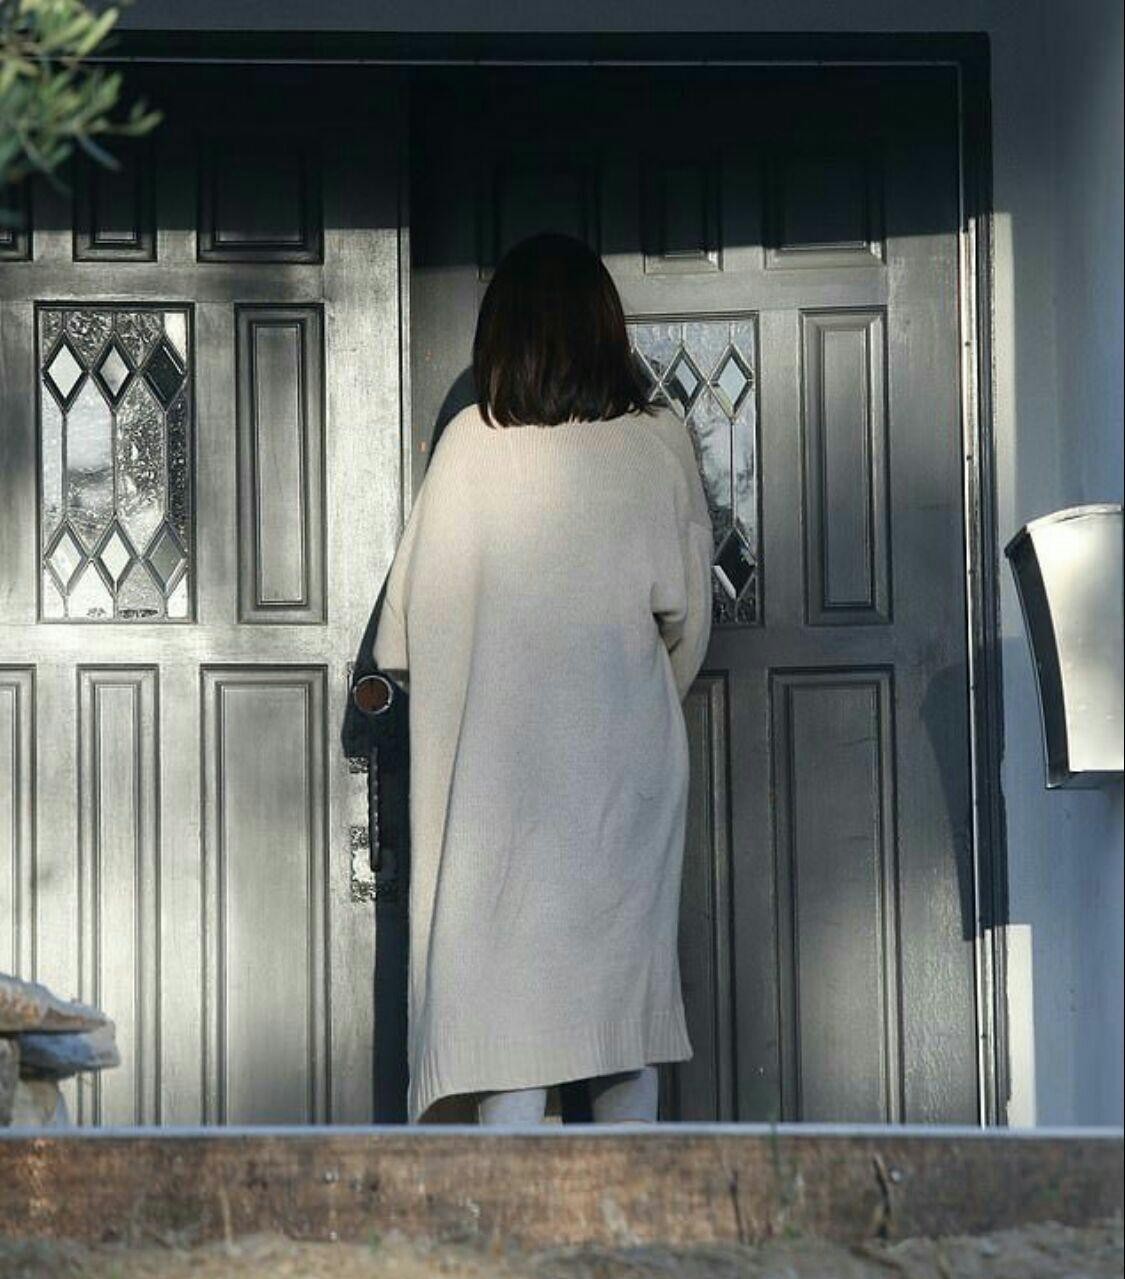 سلنا درحال رفتن به خونه ی دوستش